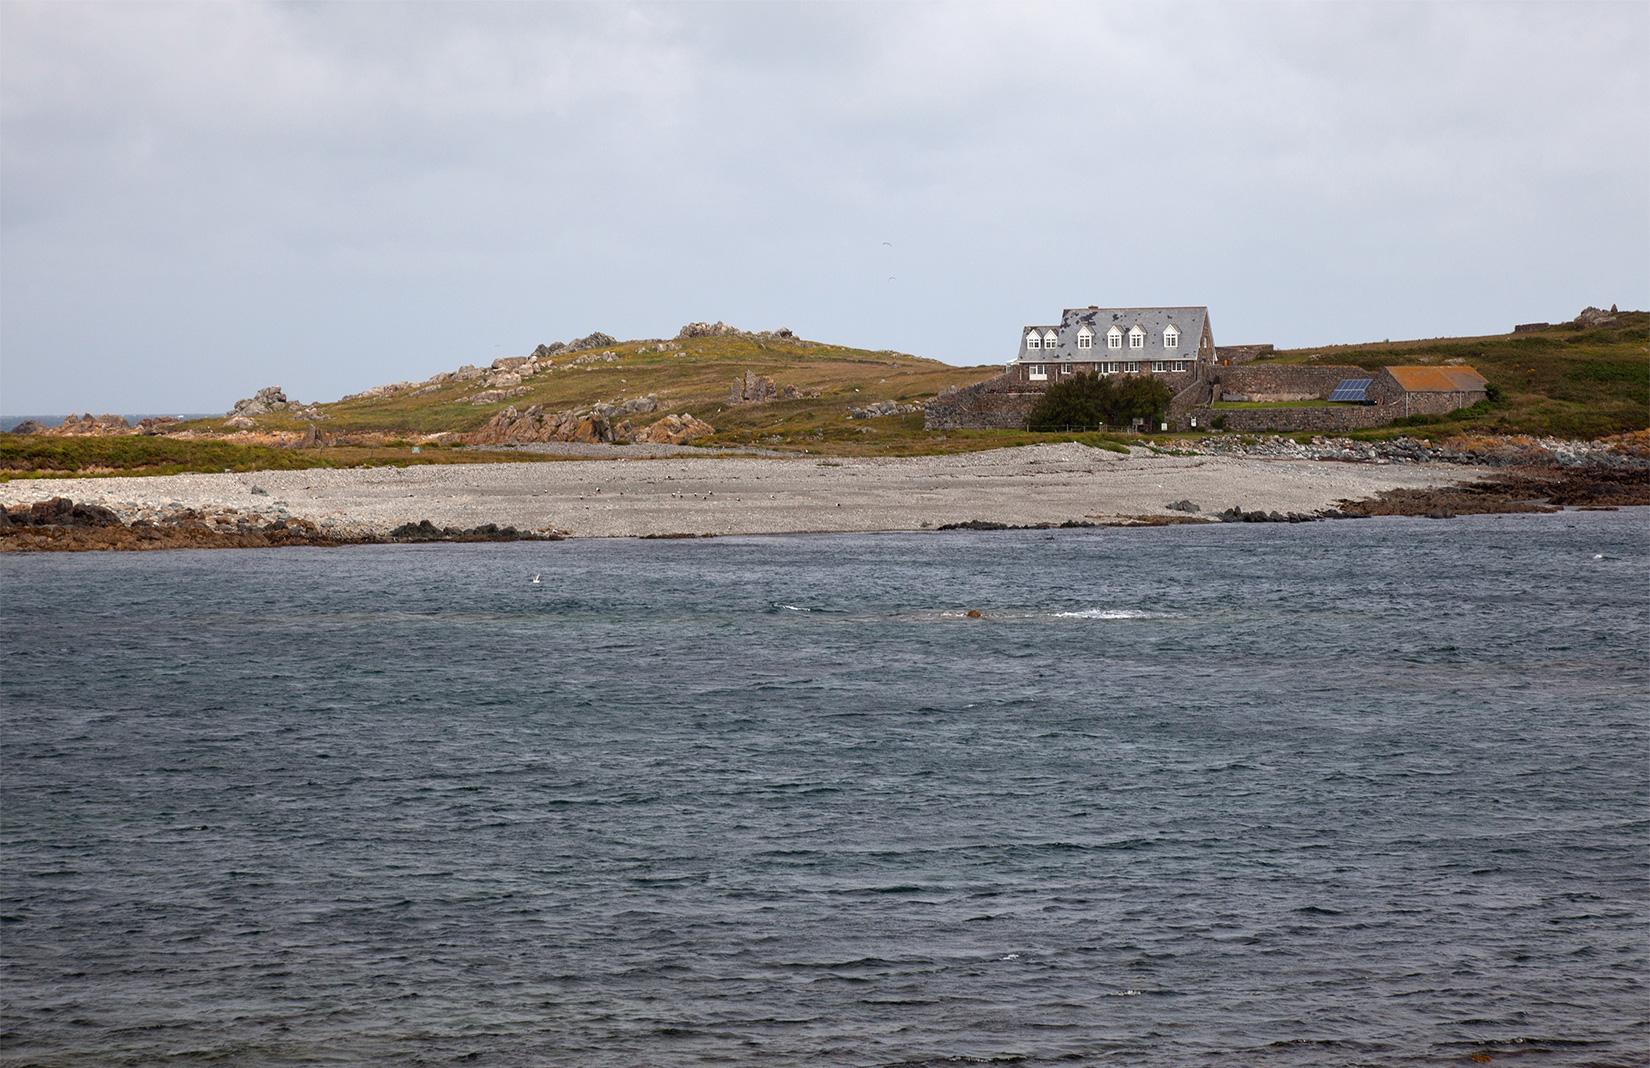 Lihou Island off the coast of Guernsey